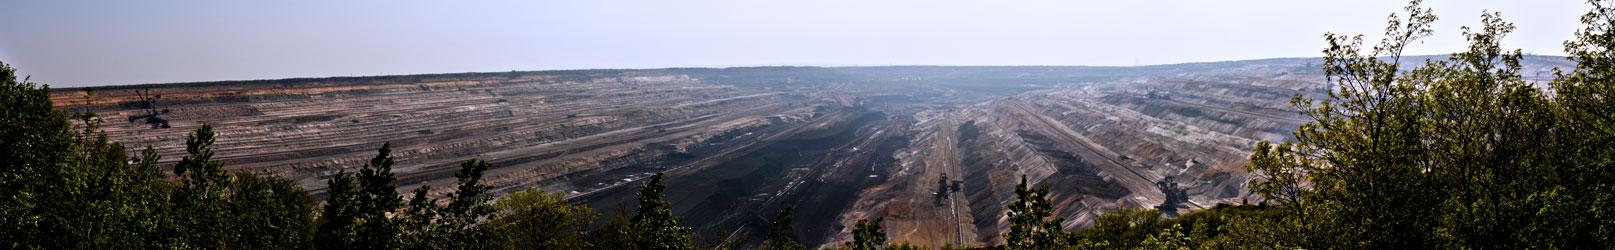 Braunkohle Tagebau Hambach